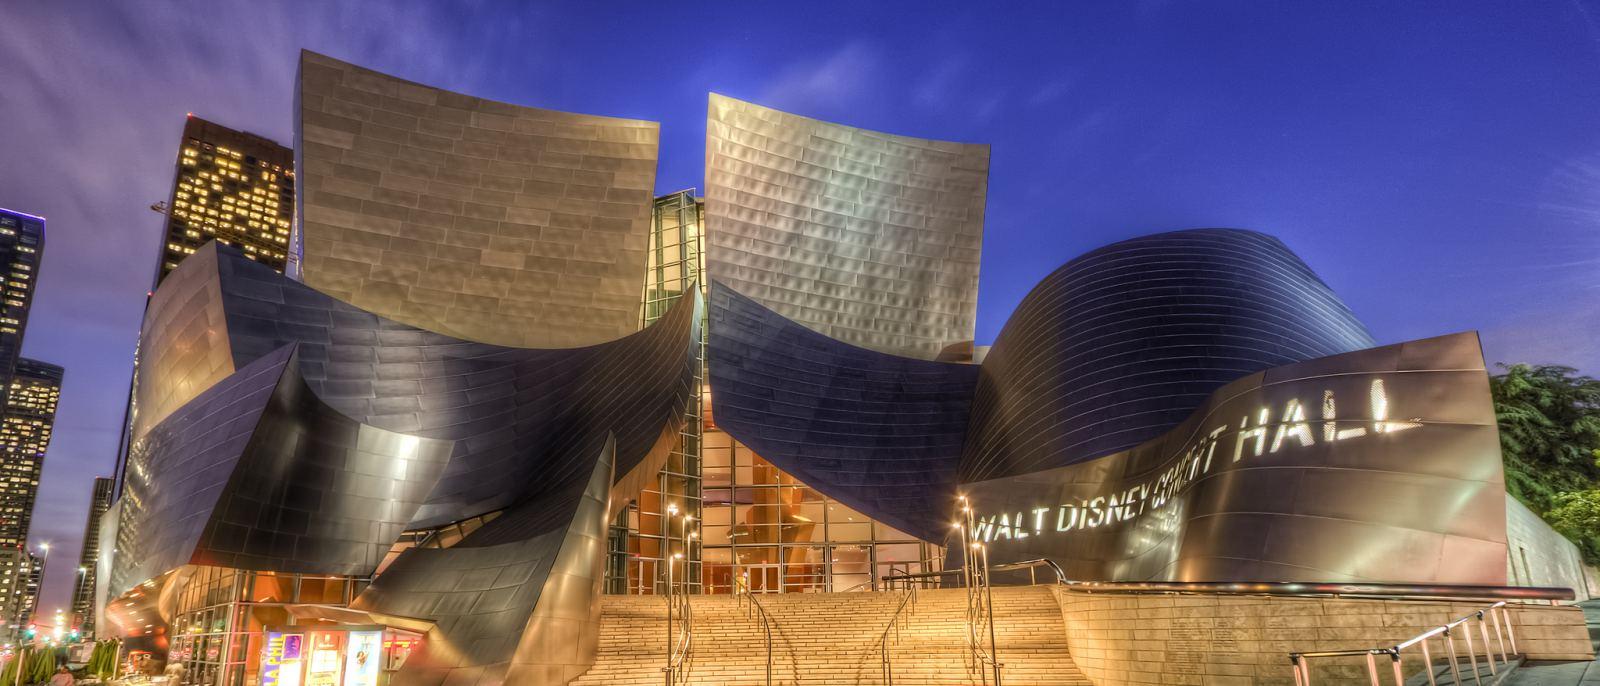 Walt Disney Concert Hall | Photo: Candice Montgomery, Flickr